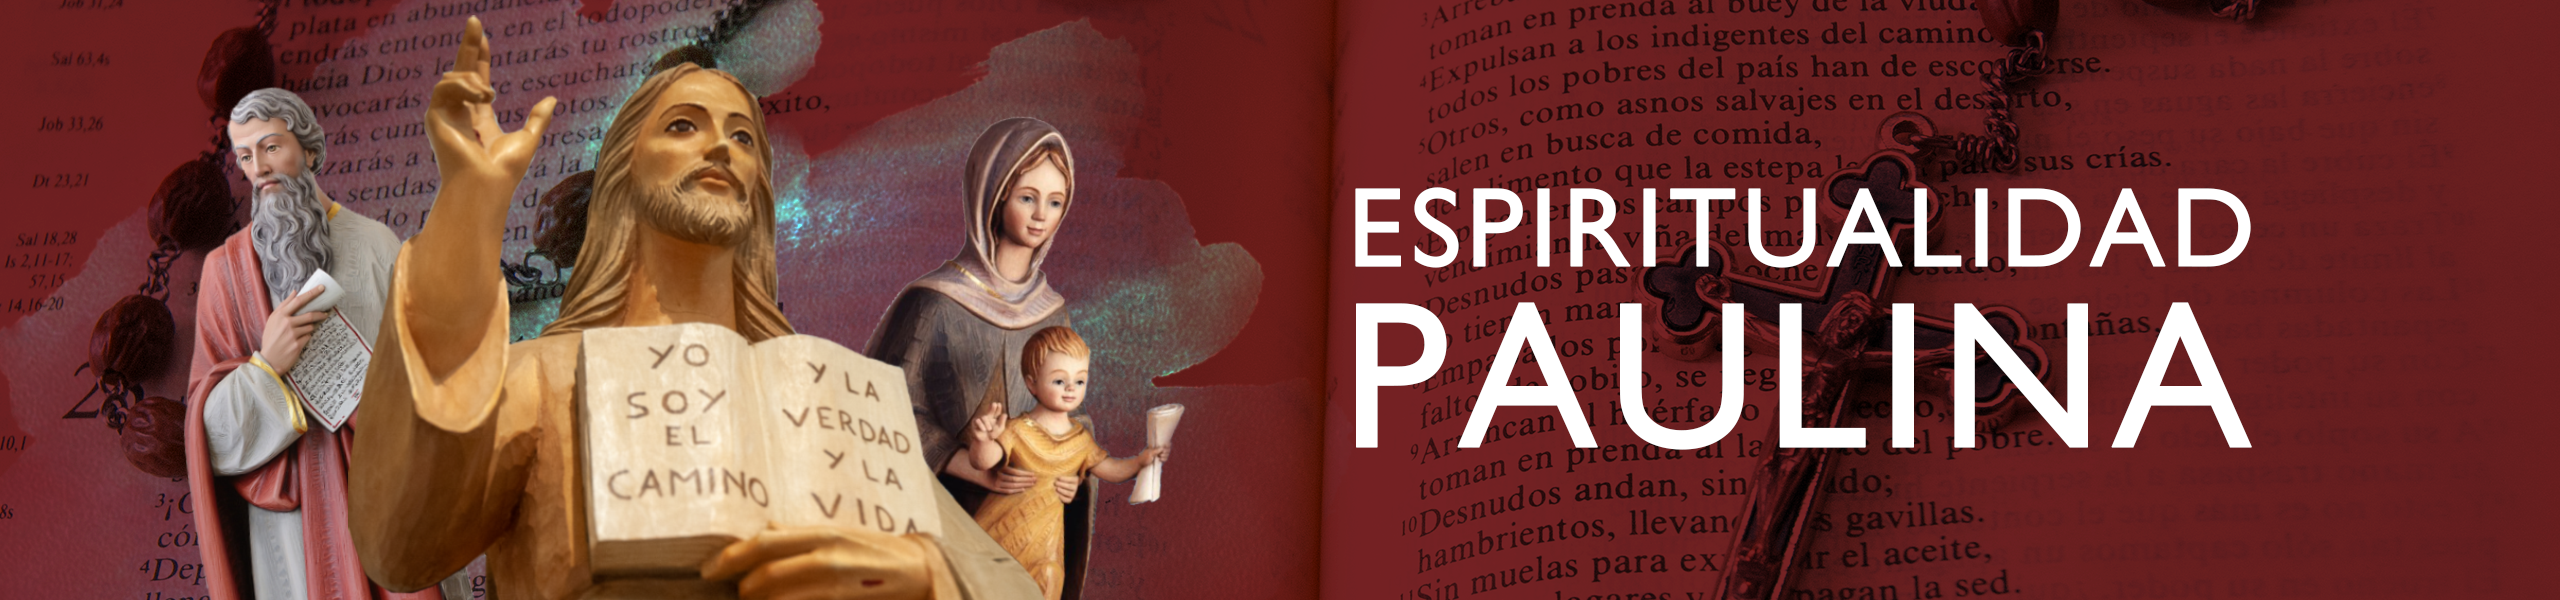 Espiritualidad Paulina